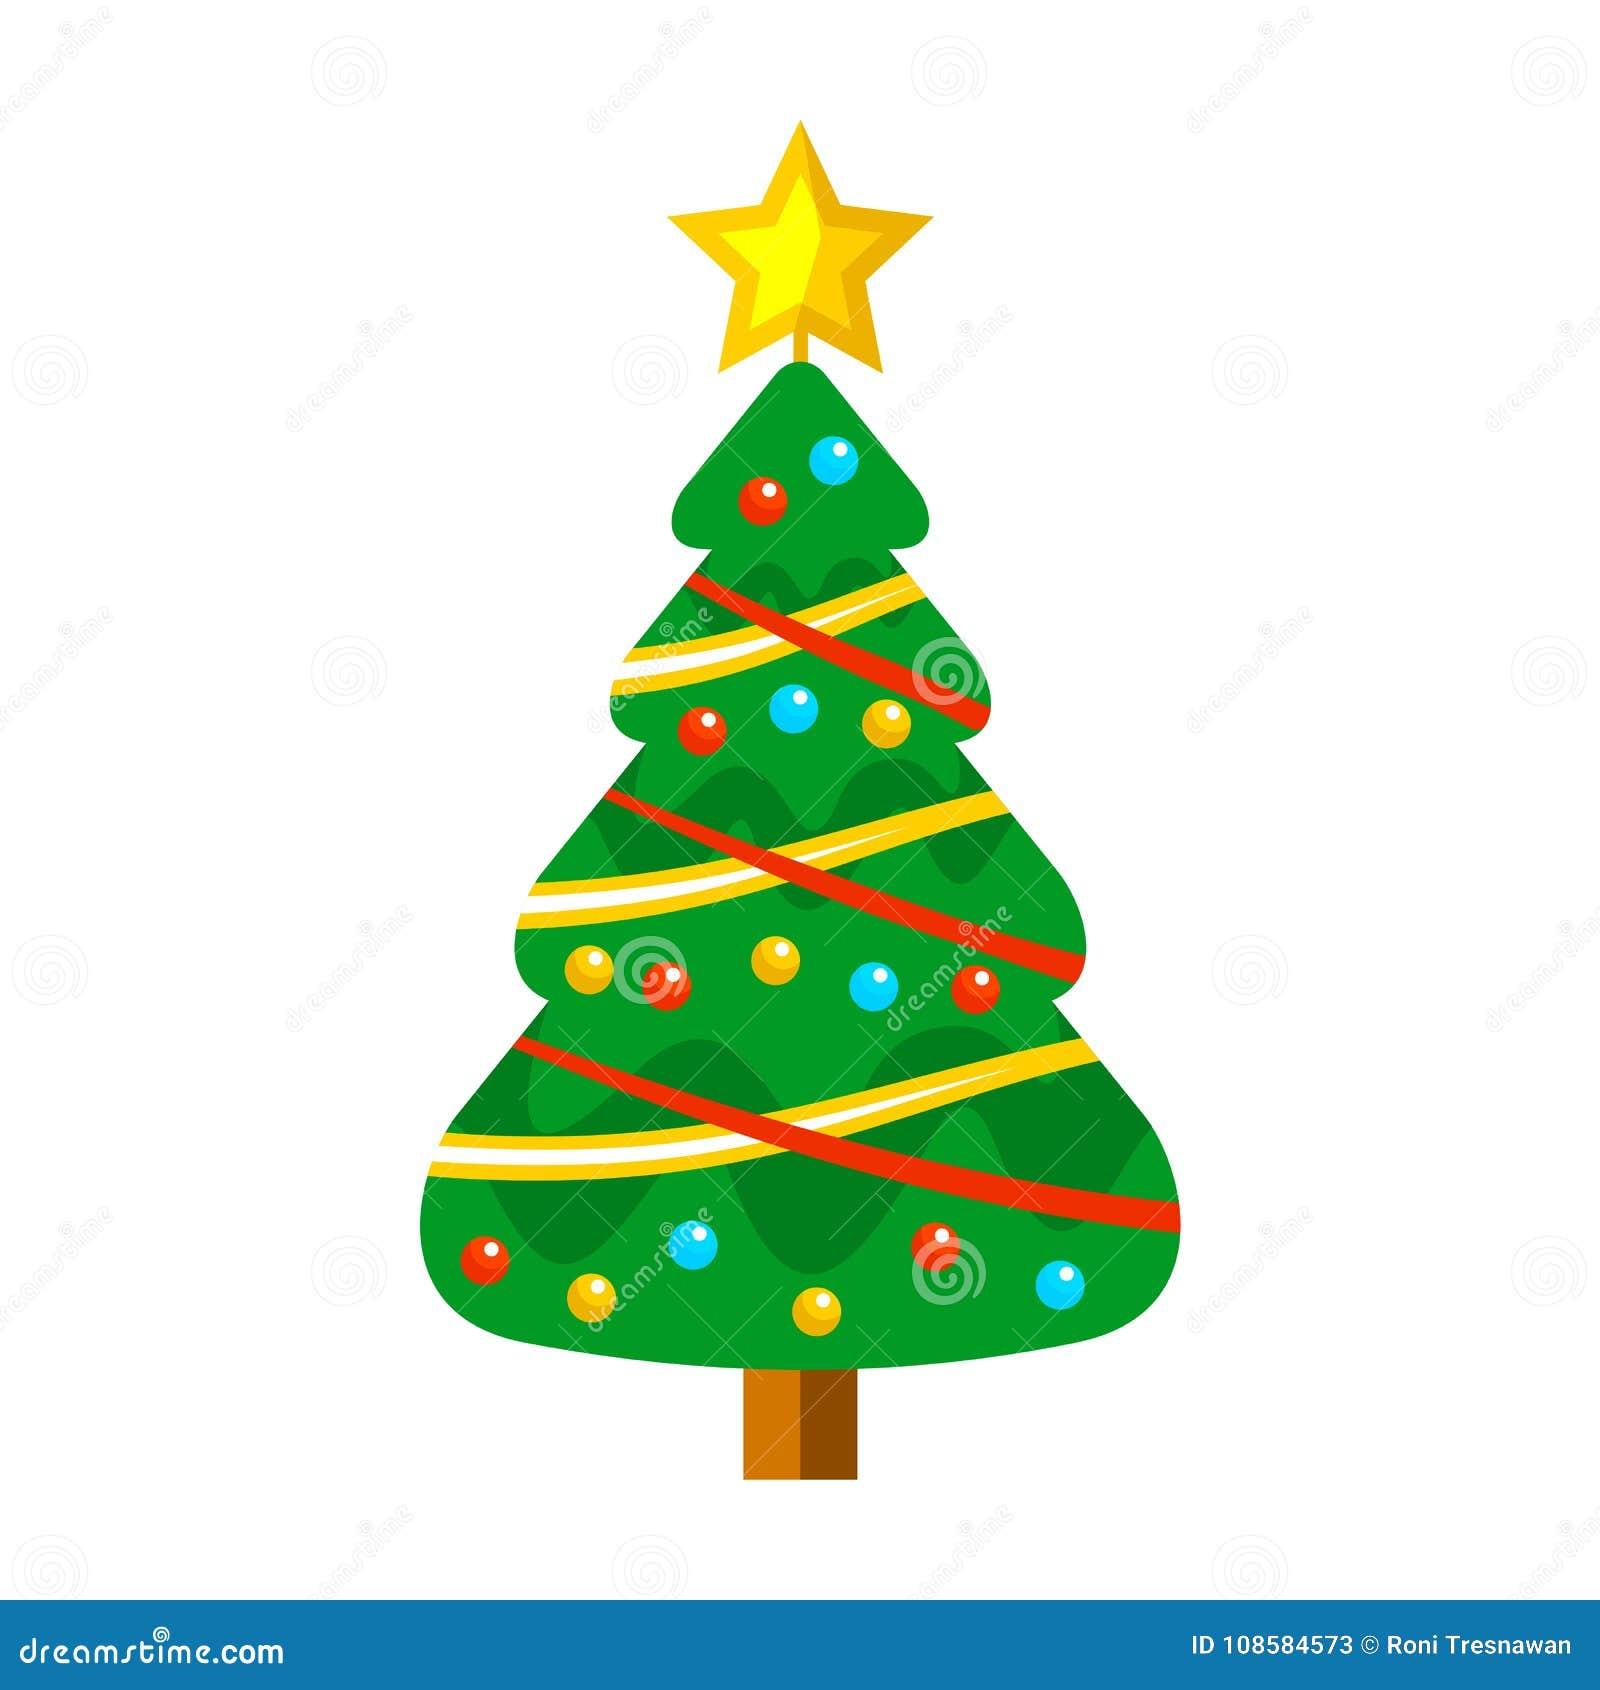 cartoon christmas tree fully decorated - Buy Fully Decorated Christmas Tree